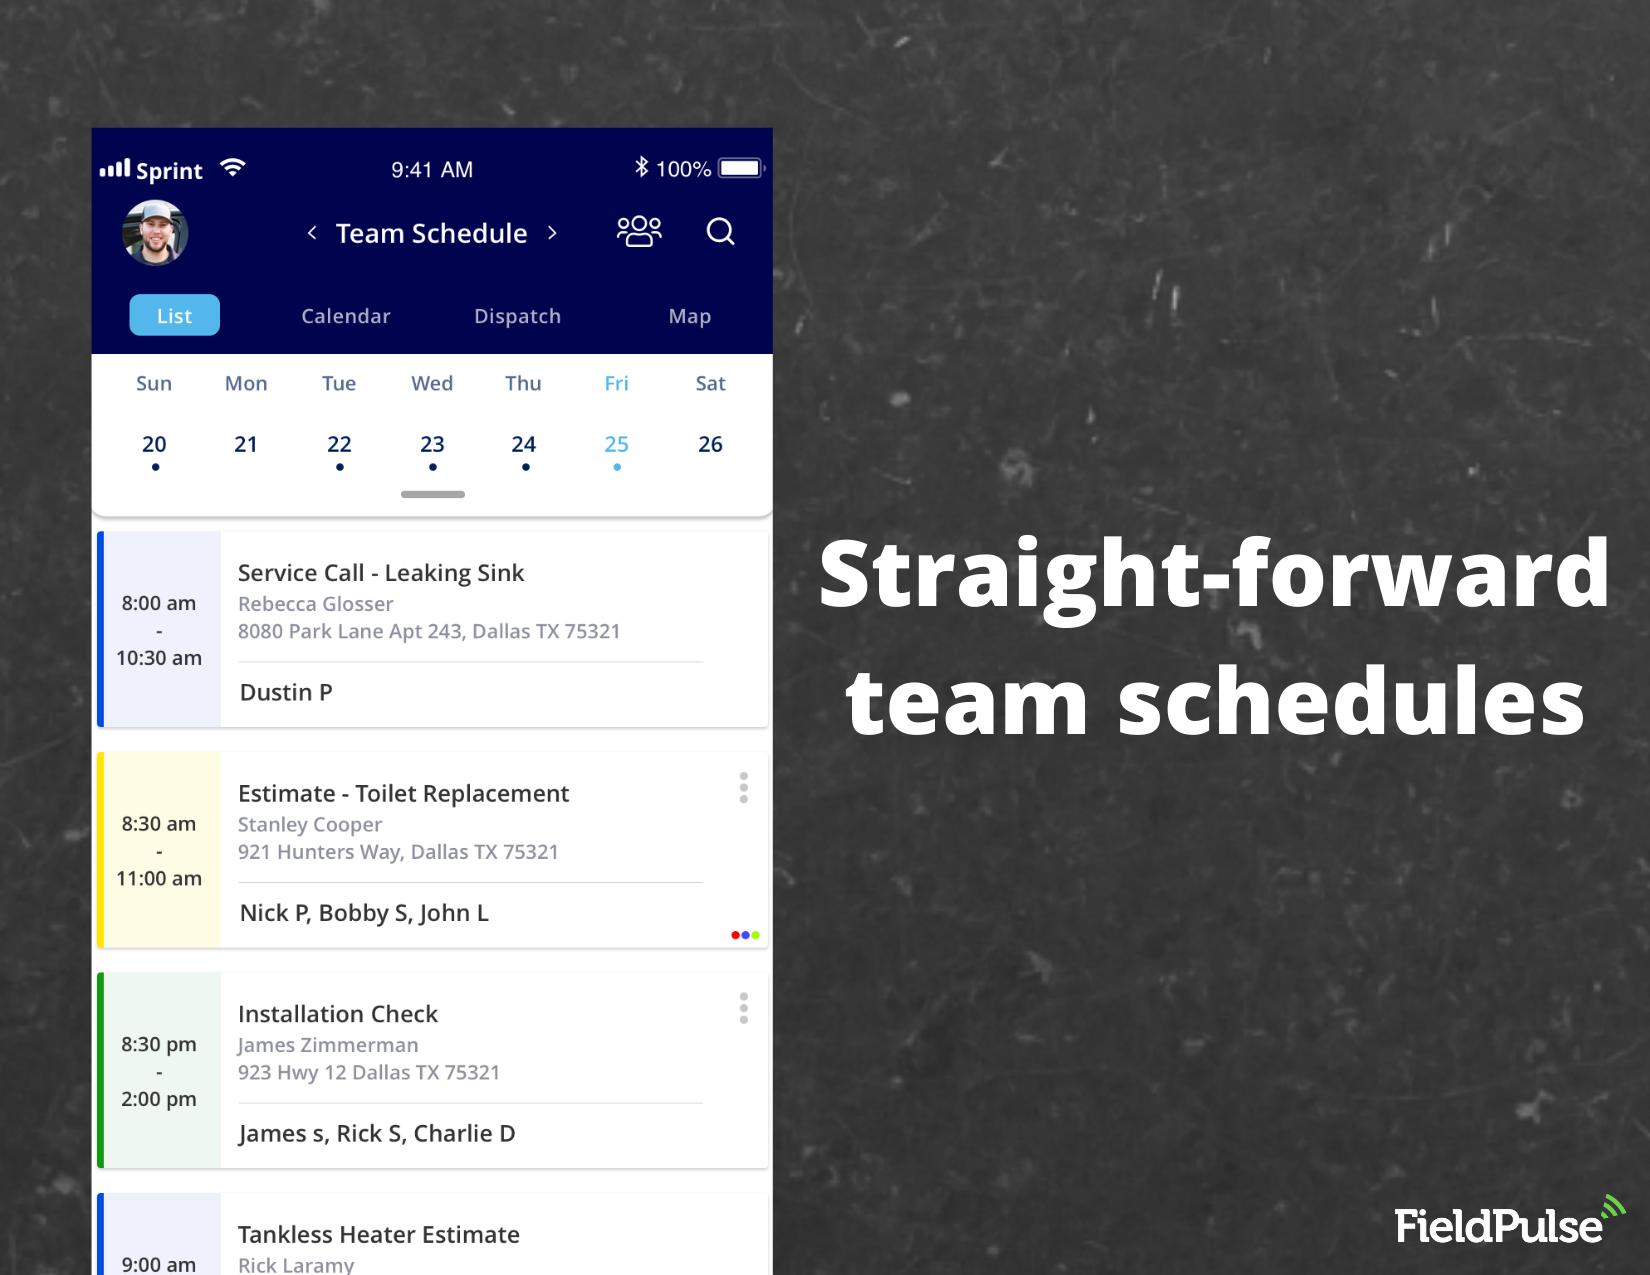 FieldPulse Software - Team schedules